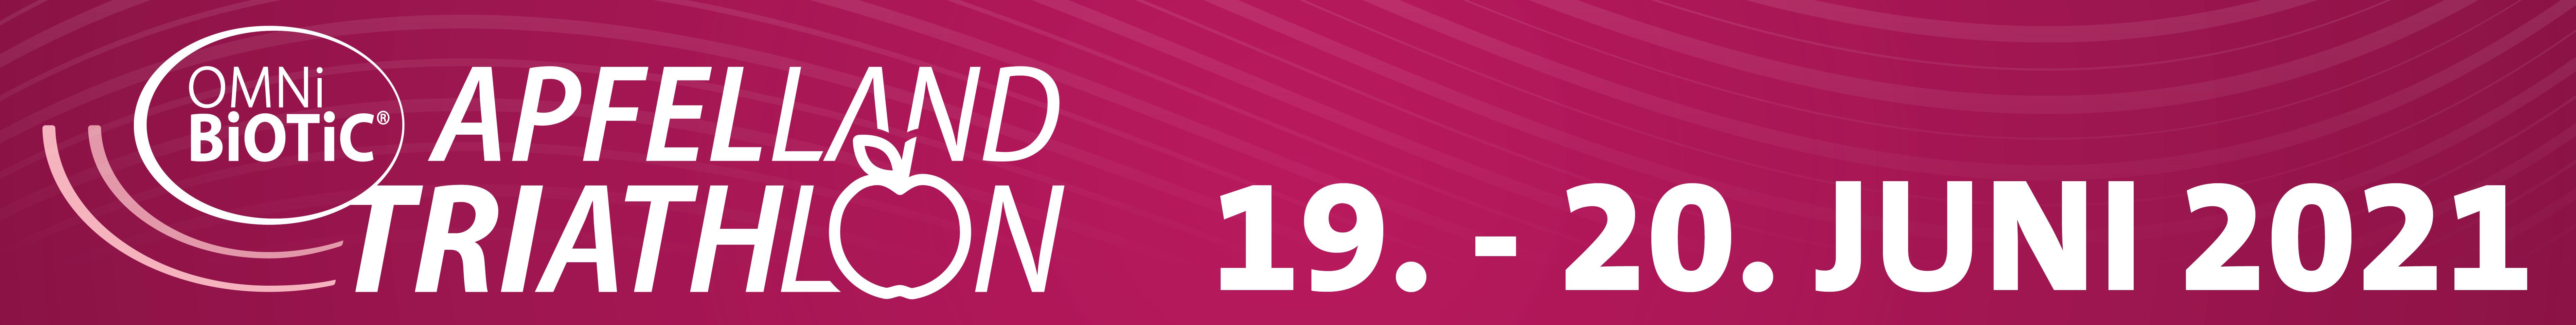 banner_1323